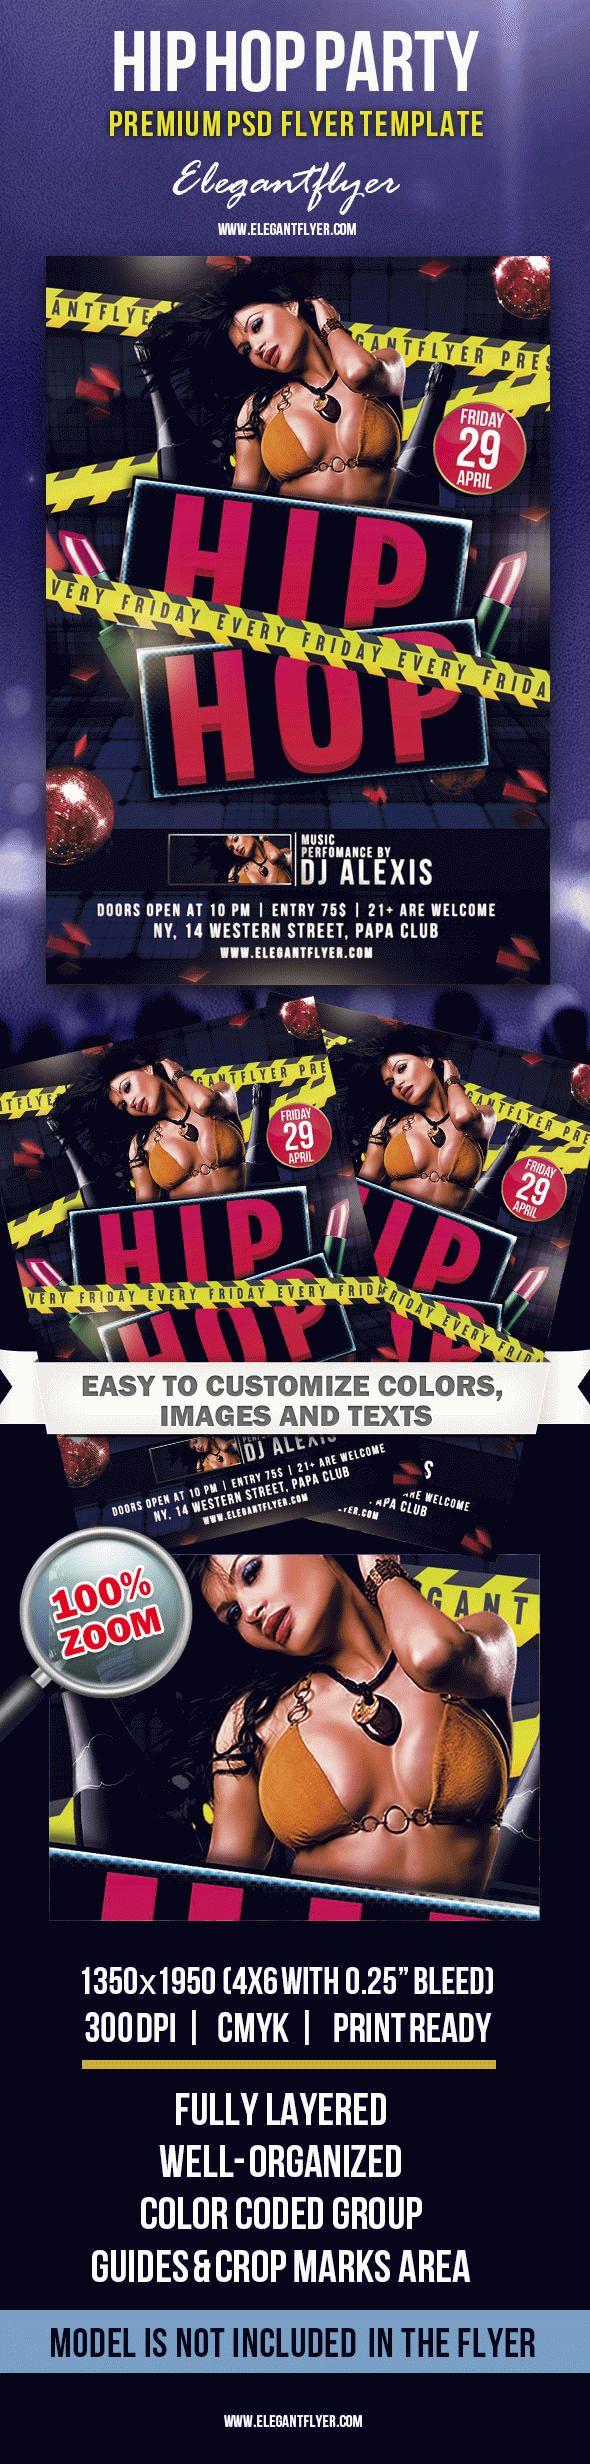 Hip Hop Party  Premium Club Flyer Psd Template with Hip Hop Certificate Template 6 Explosive Ideas